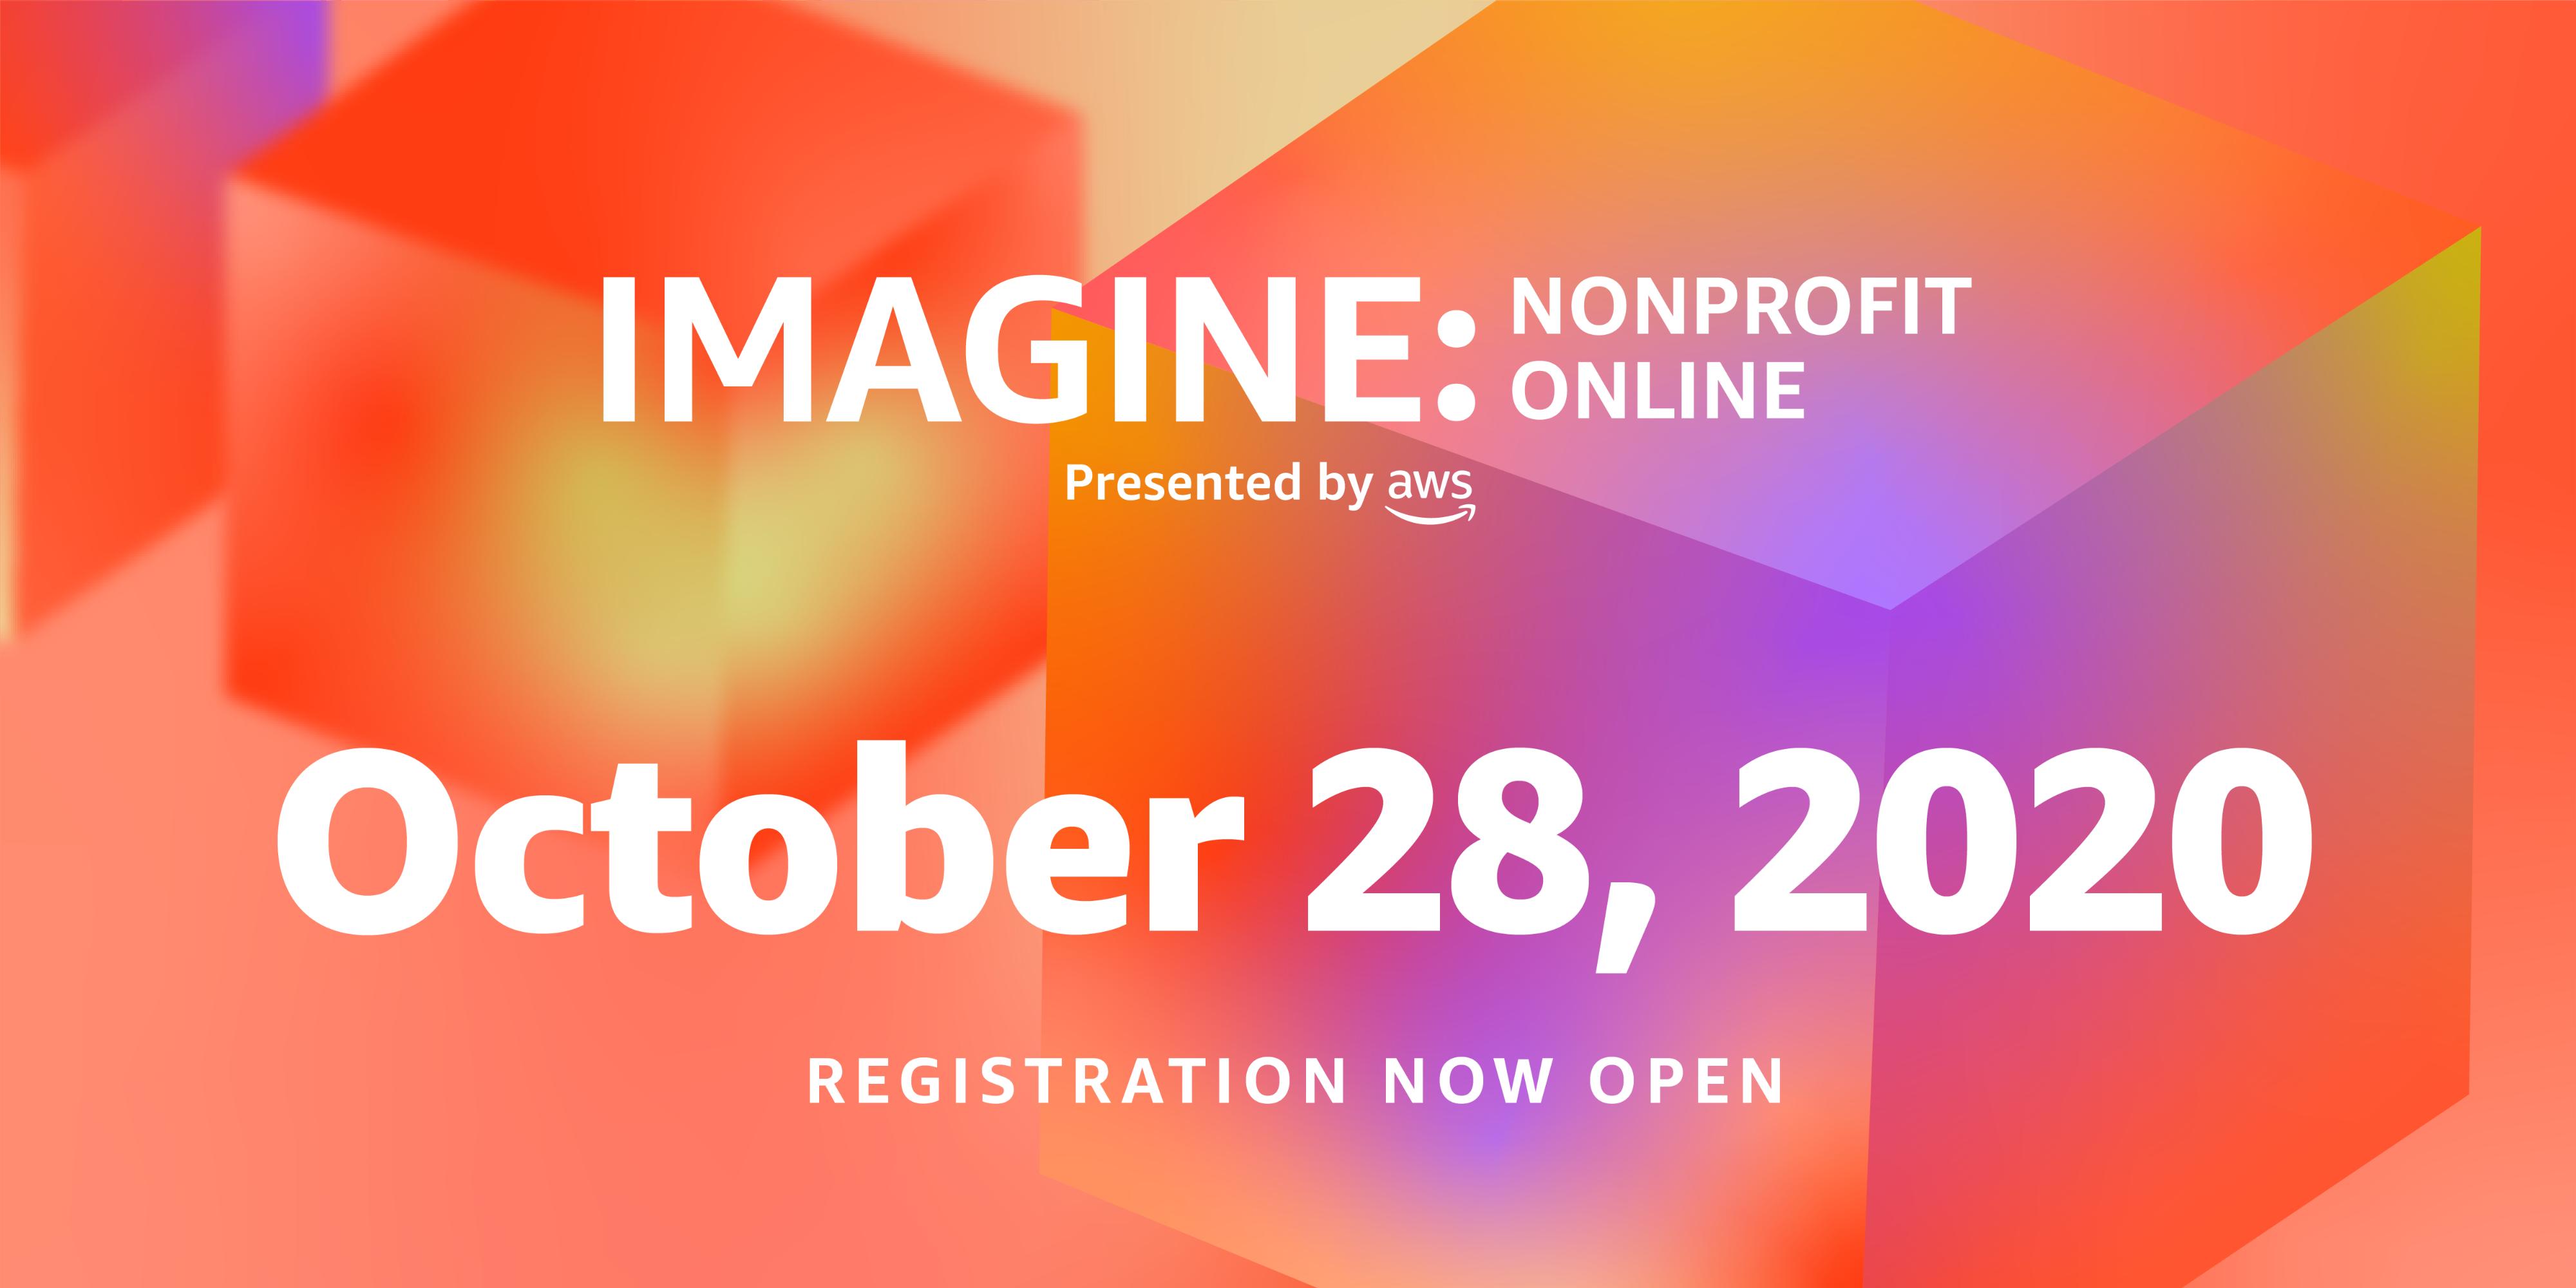 IMAGINE Nonprofit Online Conference October 28 2020